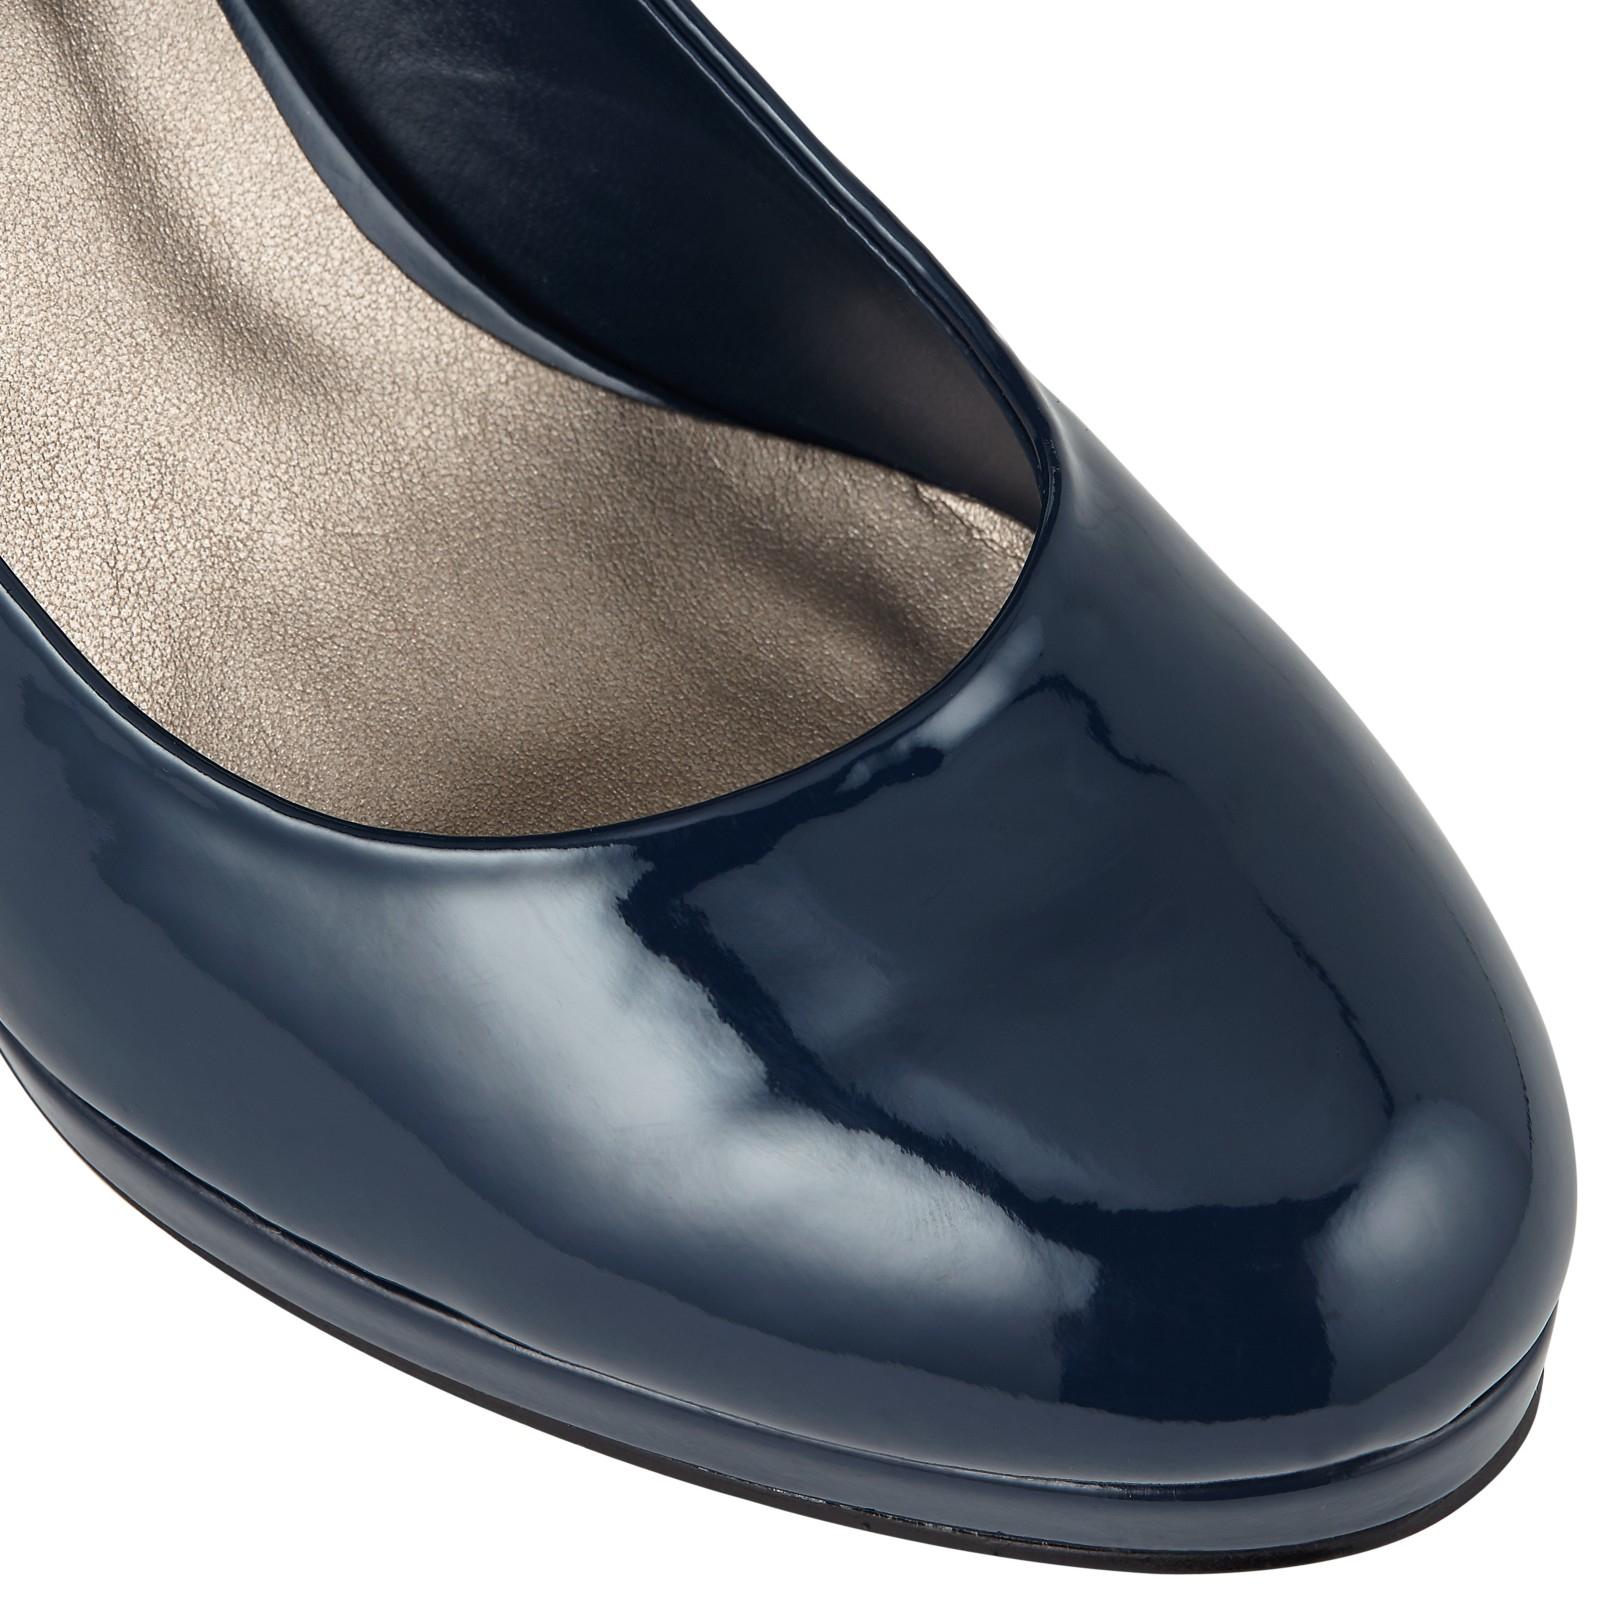 Lotus Mercury Court Shoes